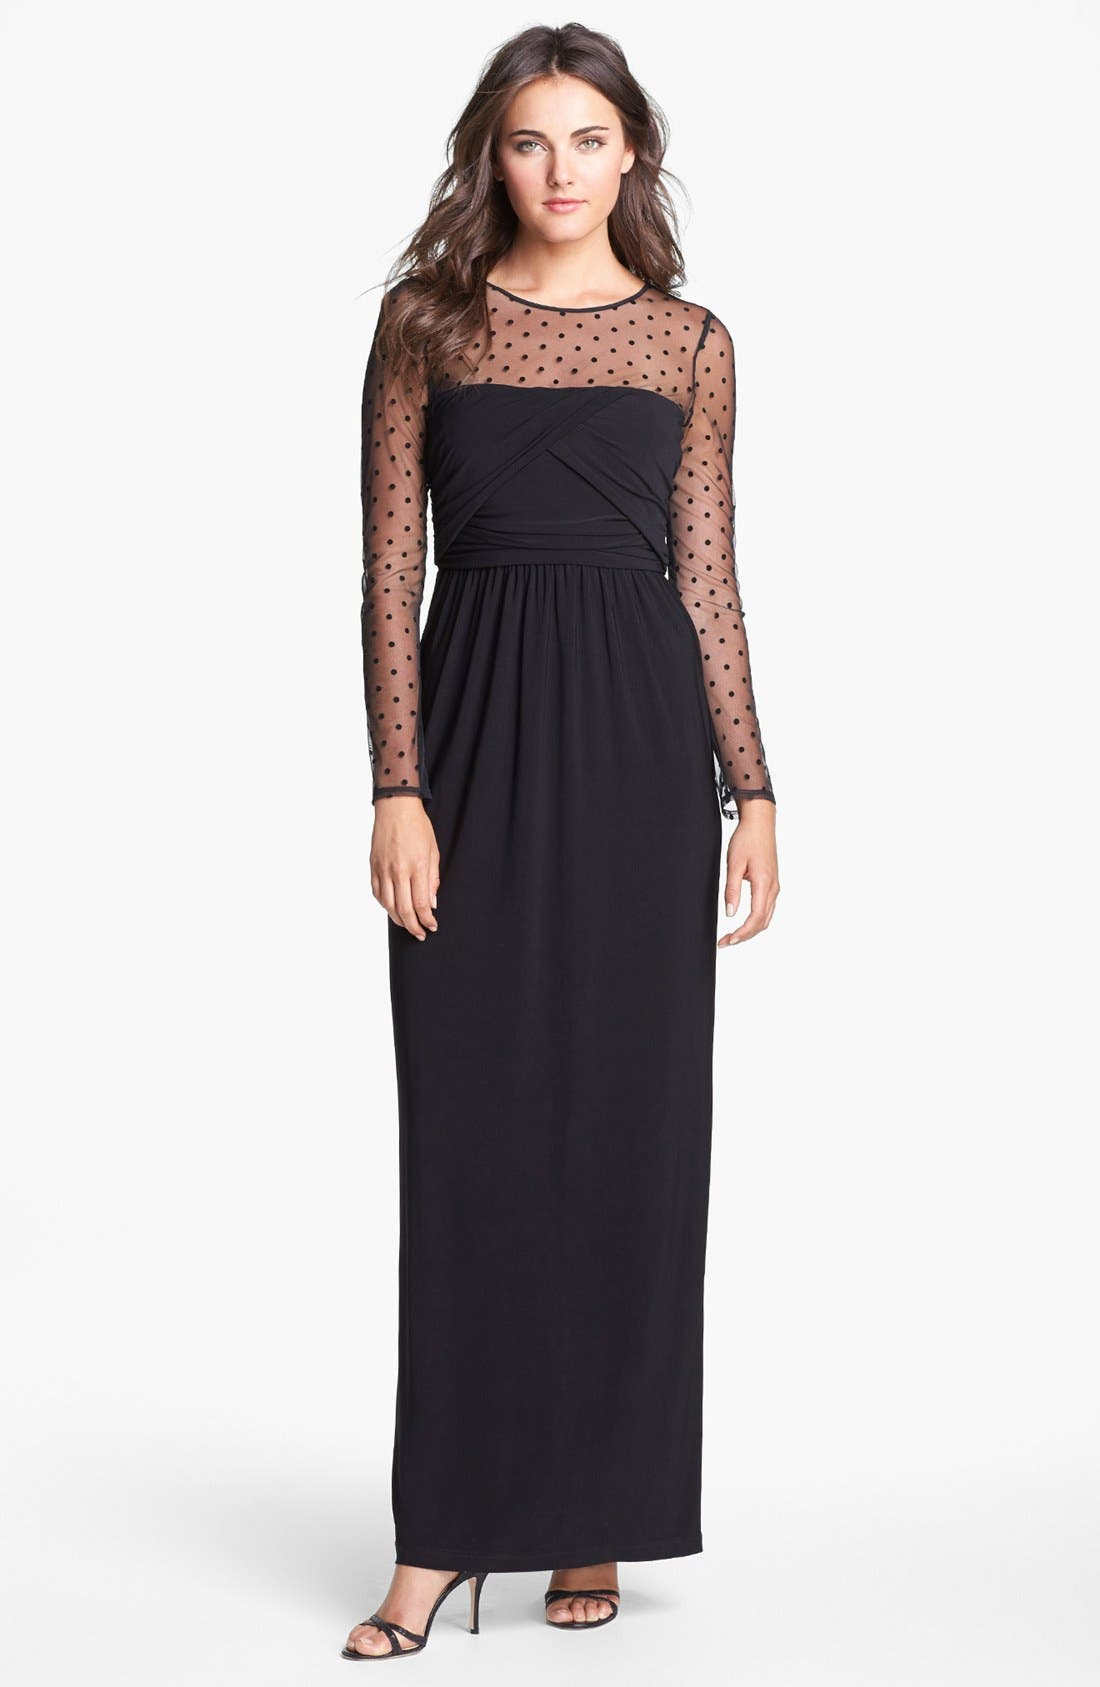 Alternate Image 1 Selected - Eliza J Illusion Yoke Jersey Maxi Dress (Regular & Petite)